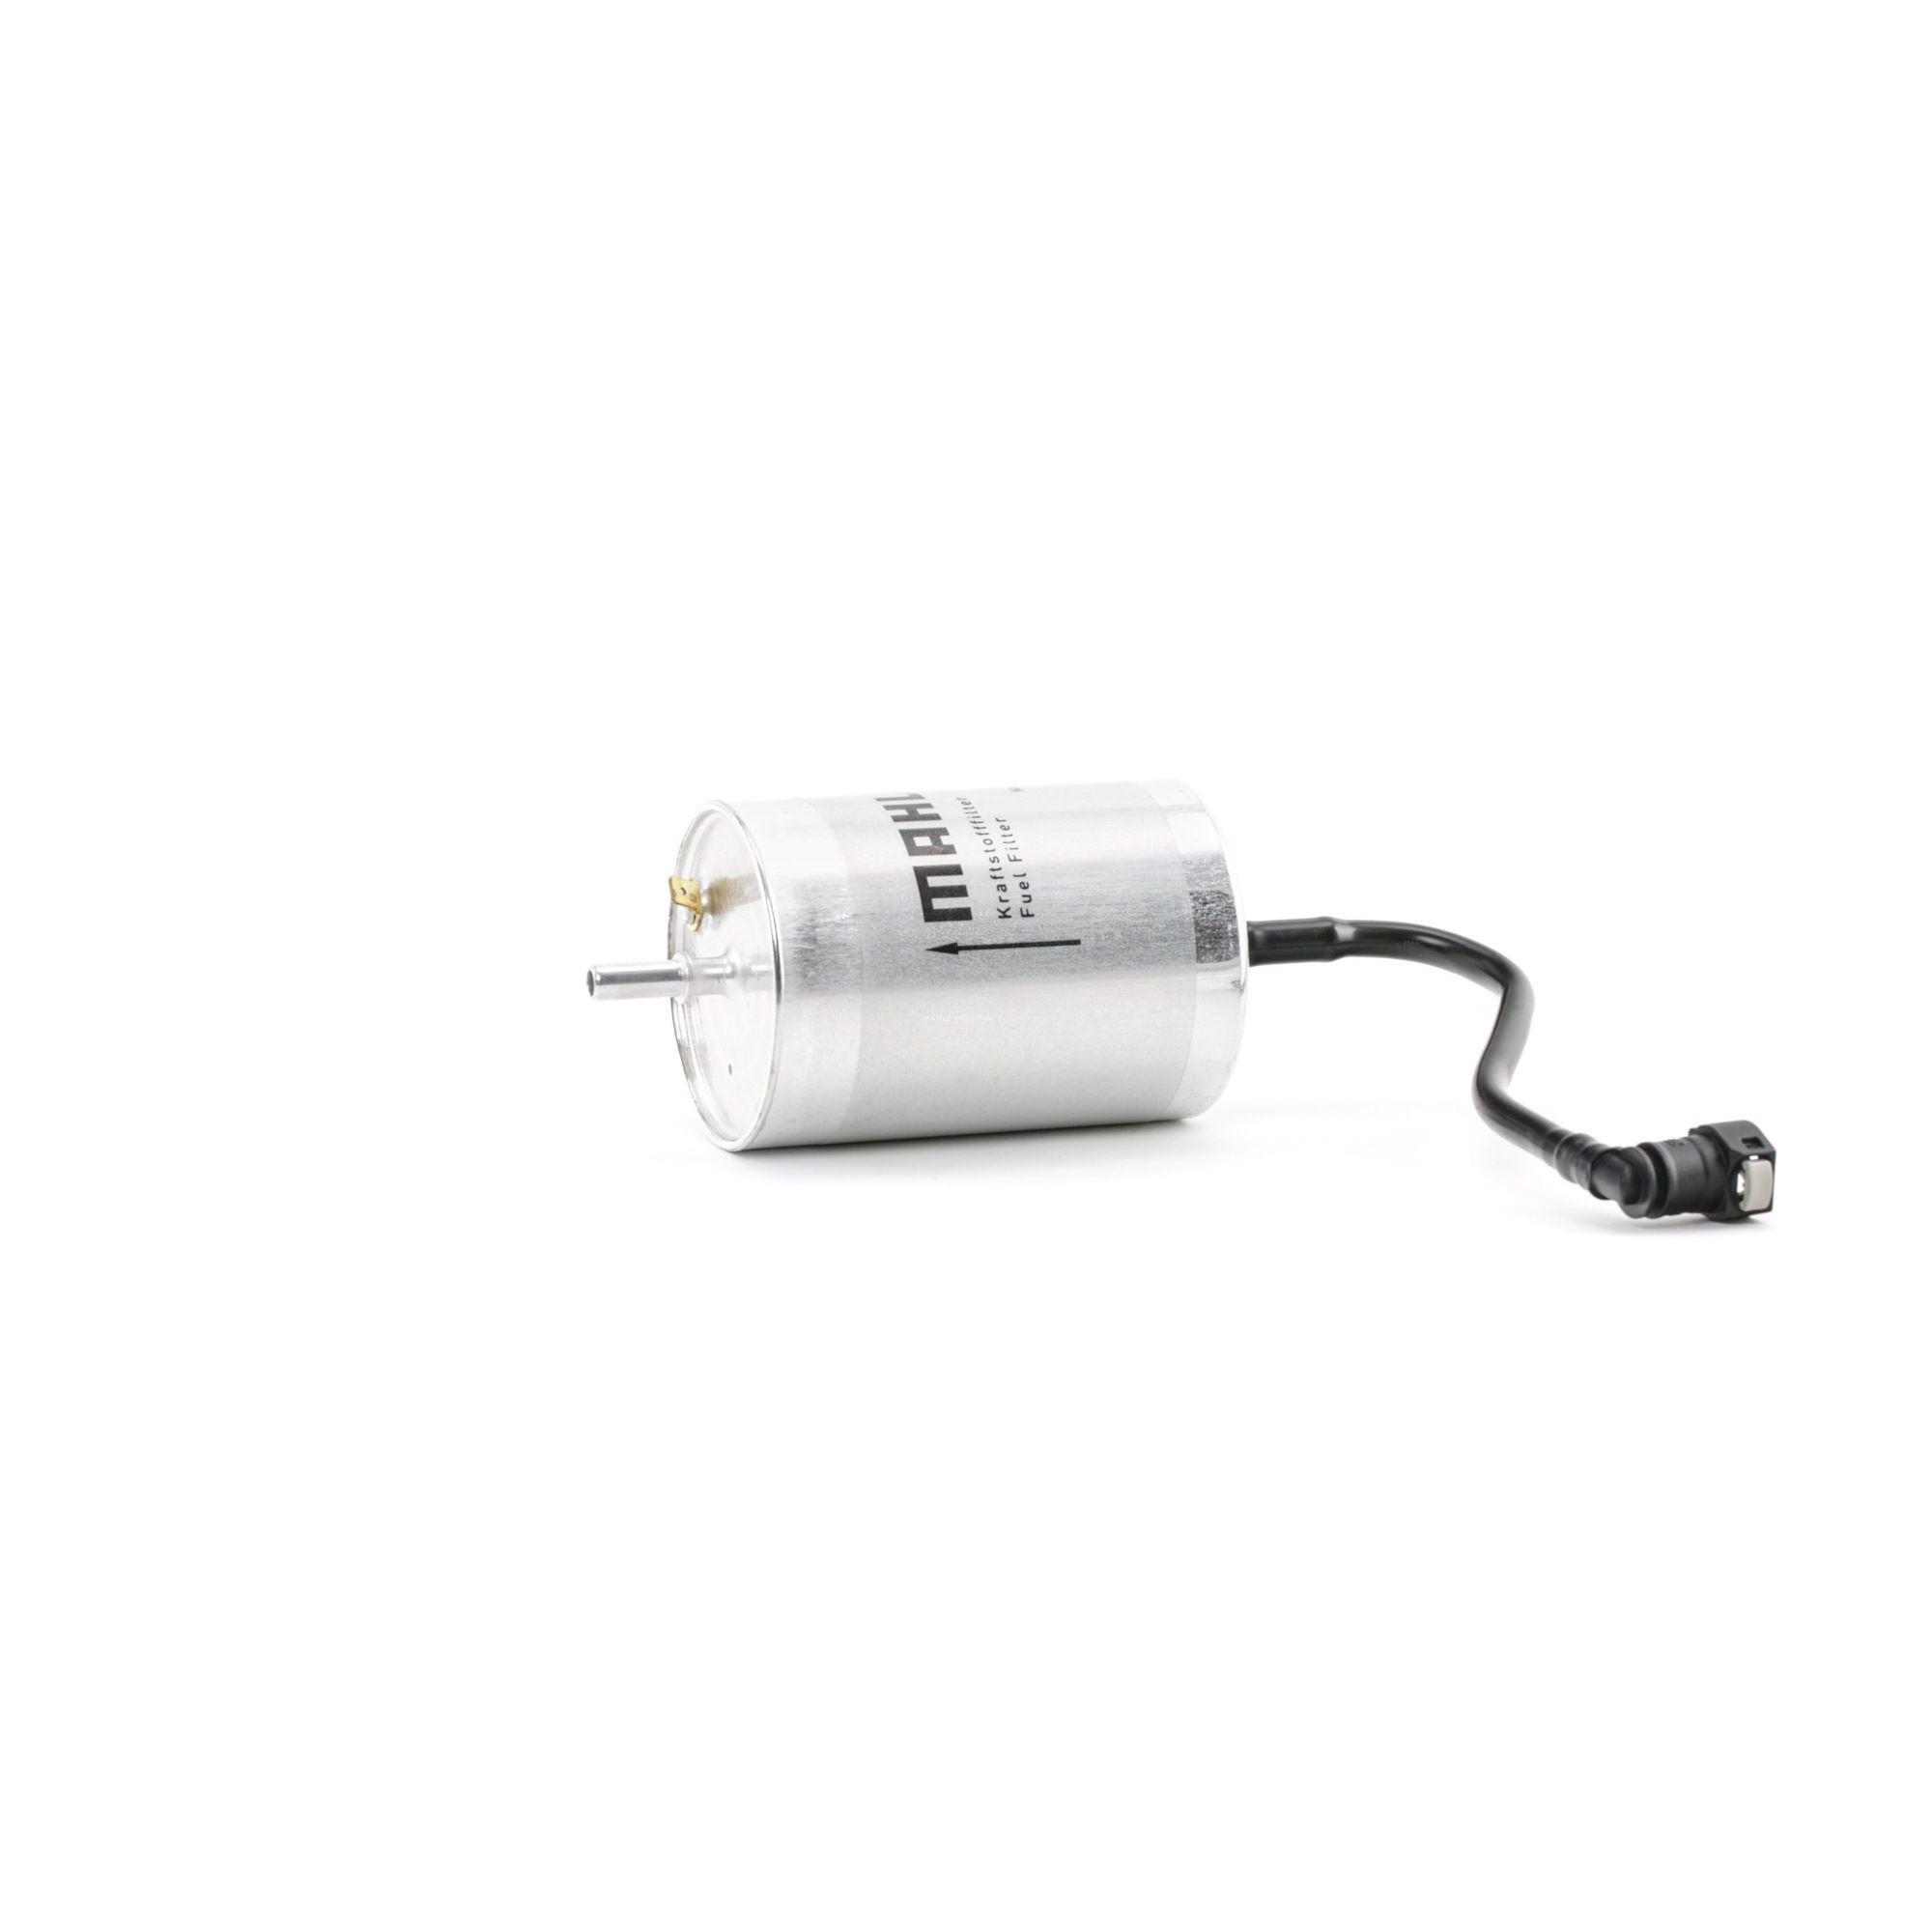 MAHLE ORIGINAL: Original Kraftstofffilter KL 80 (Höhe: 167mm, Gehäusedurchmesser: 75mm)